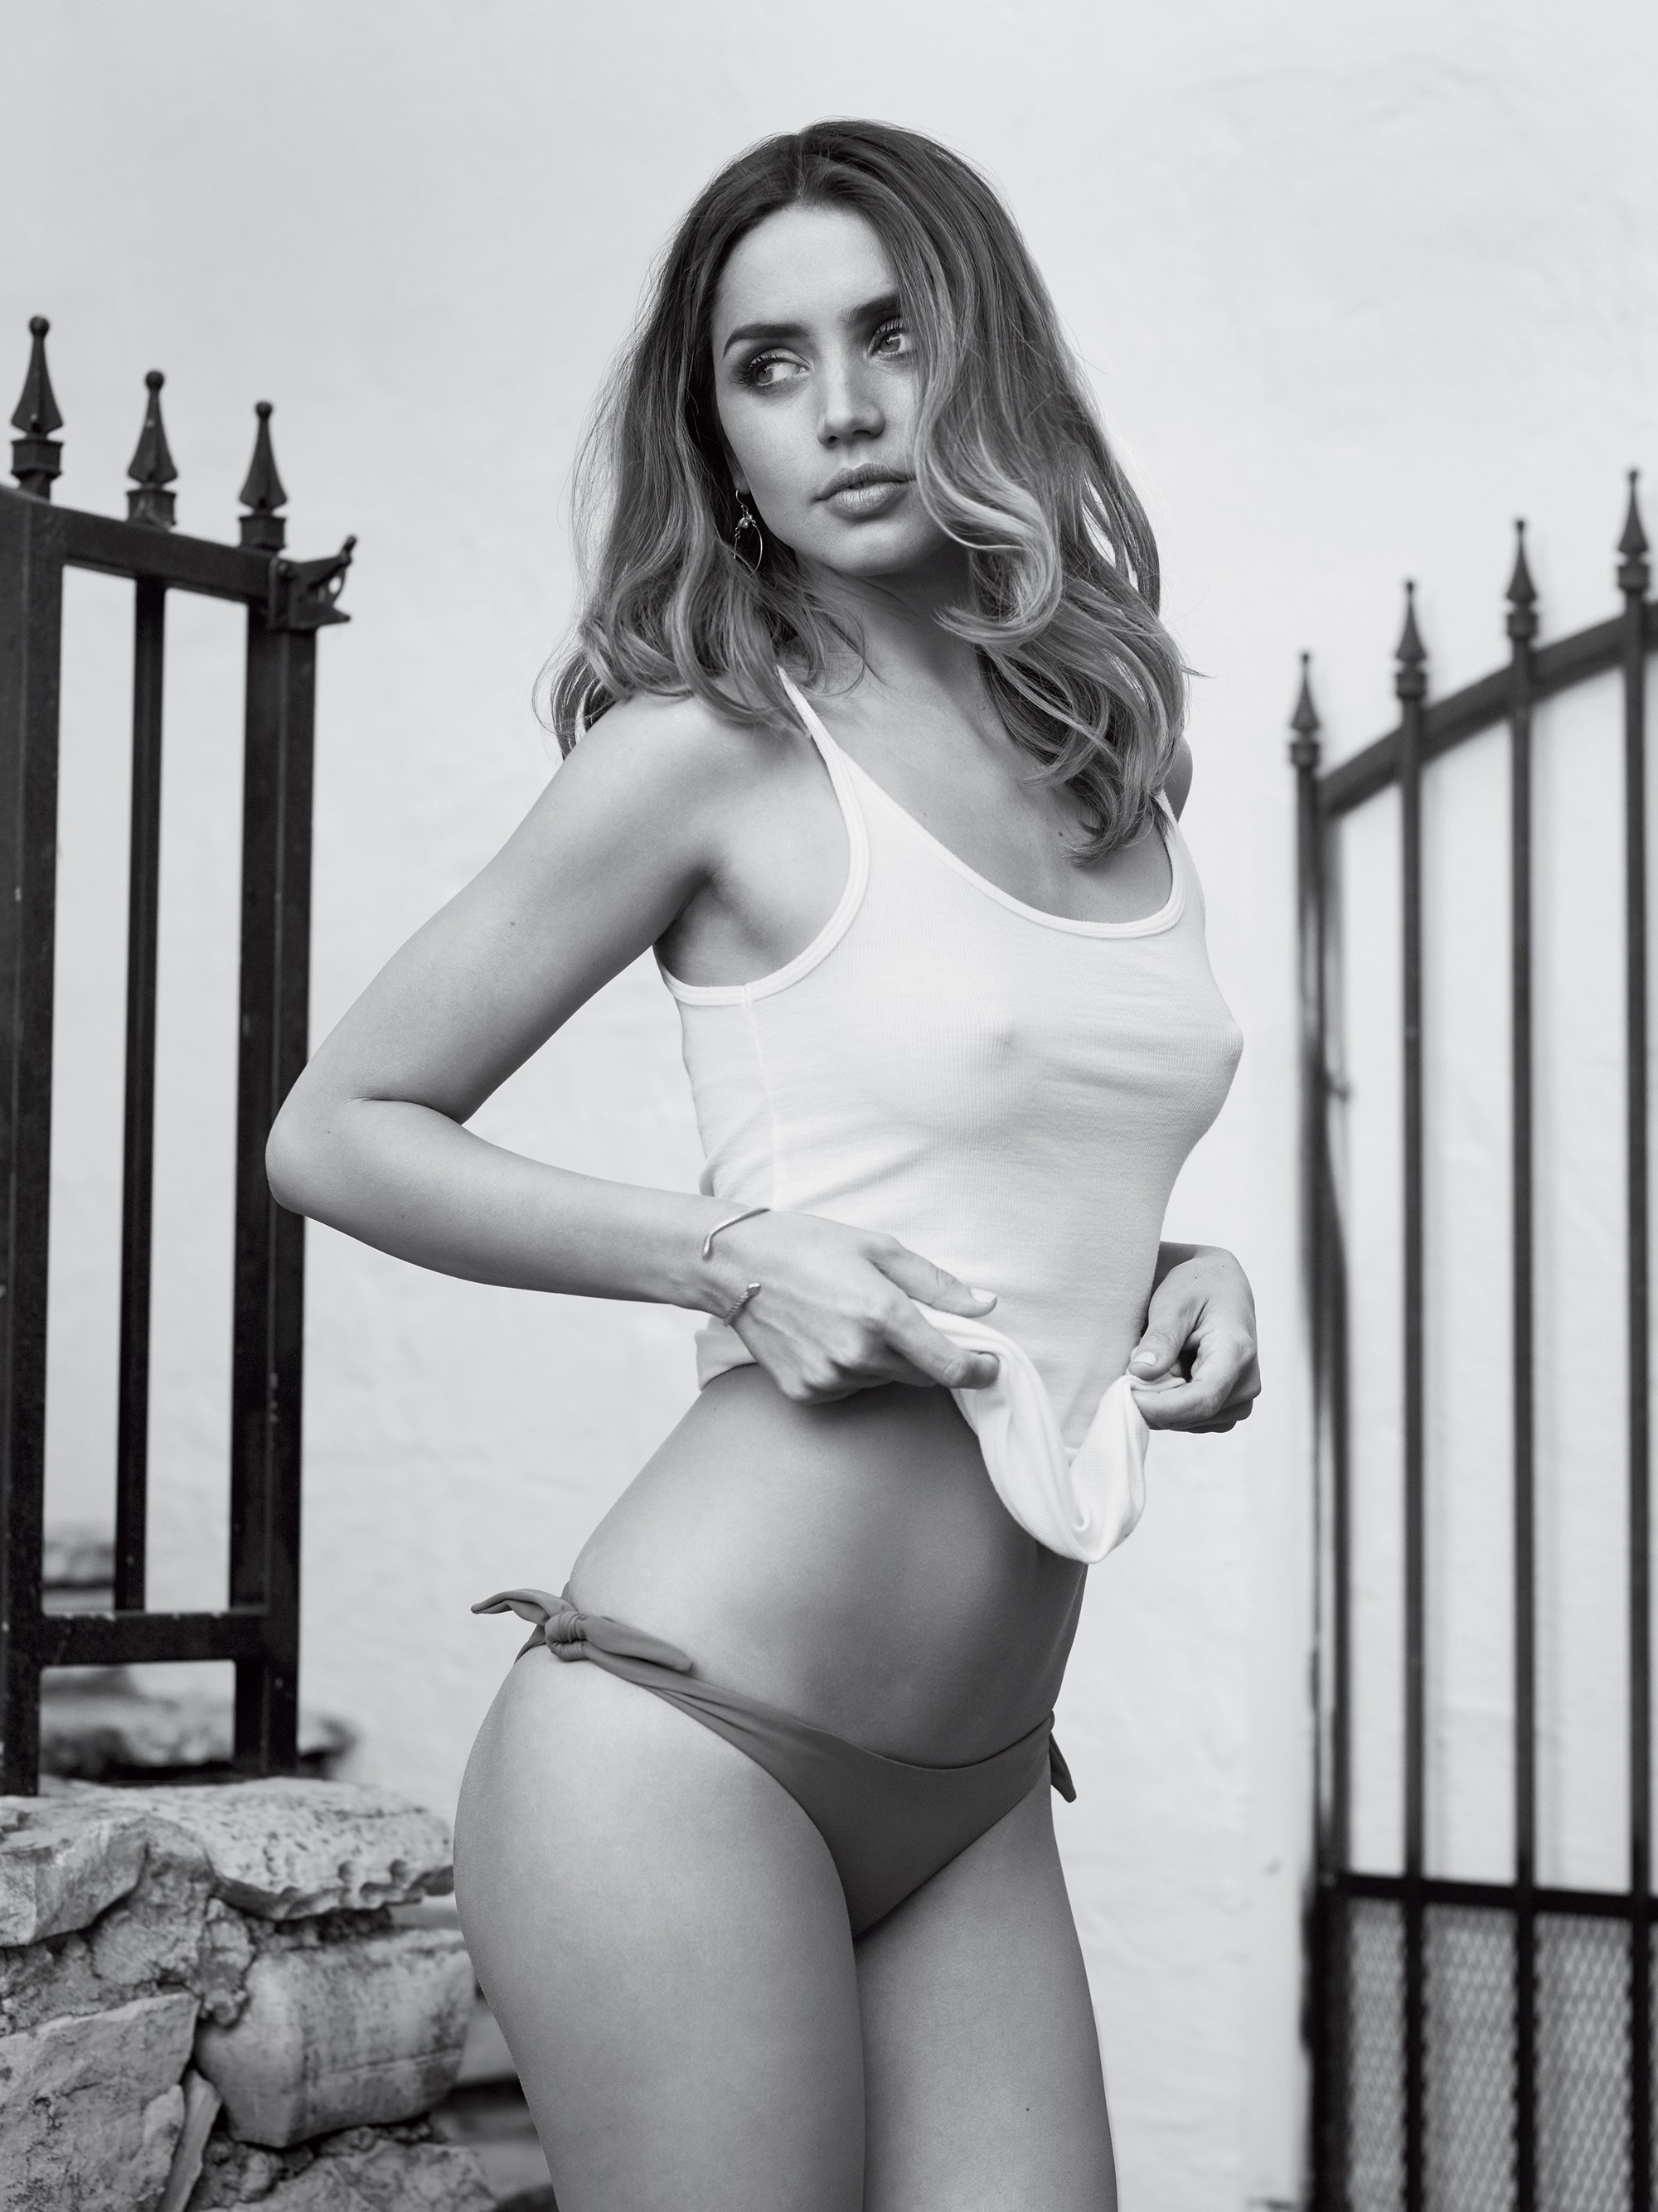 Ana Brenda Des Nuda ana sakic hot - megapornx